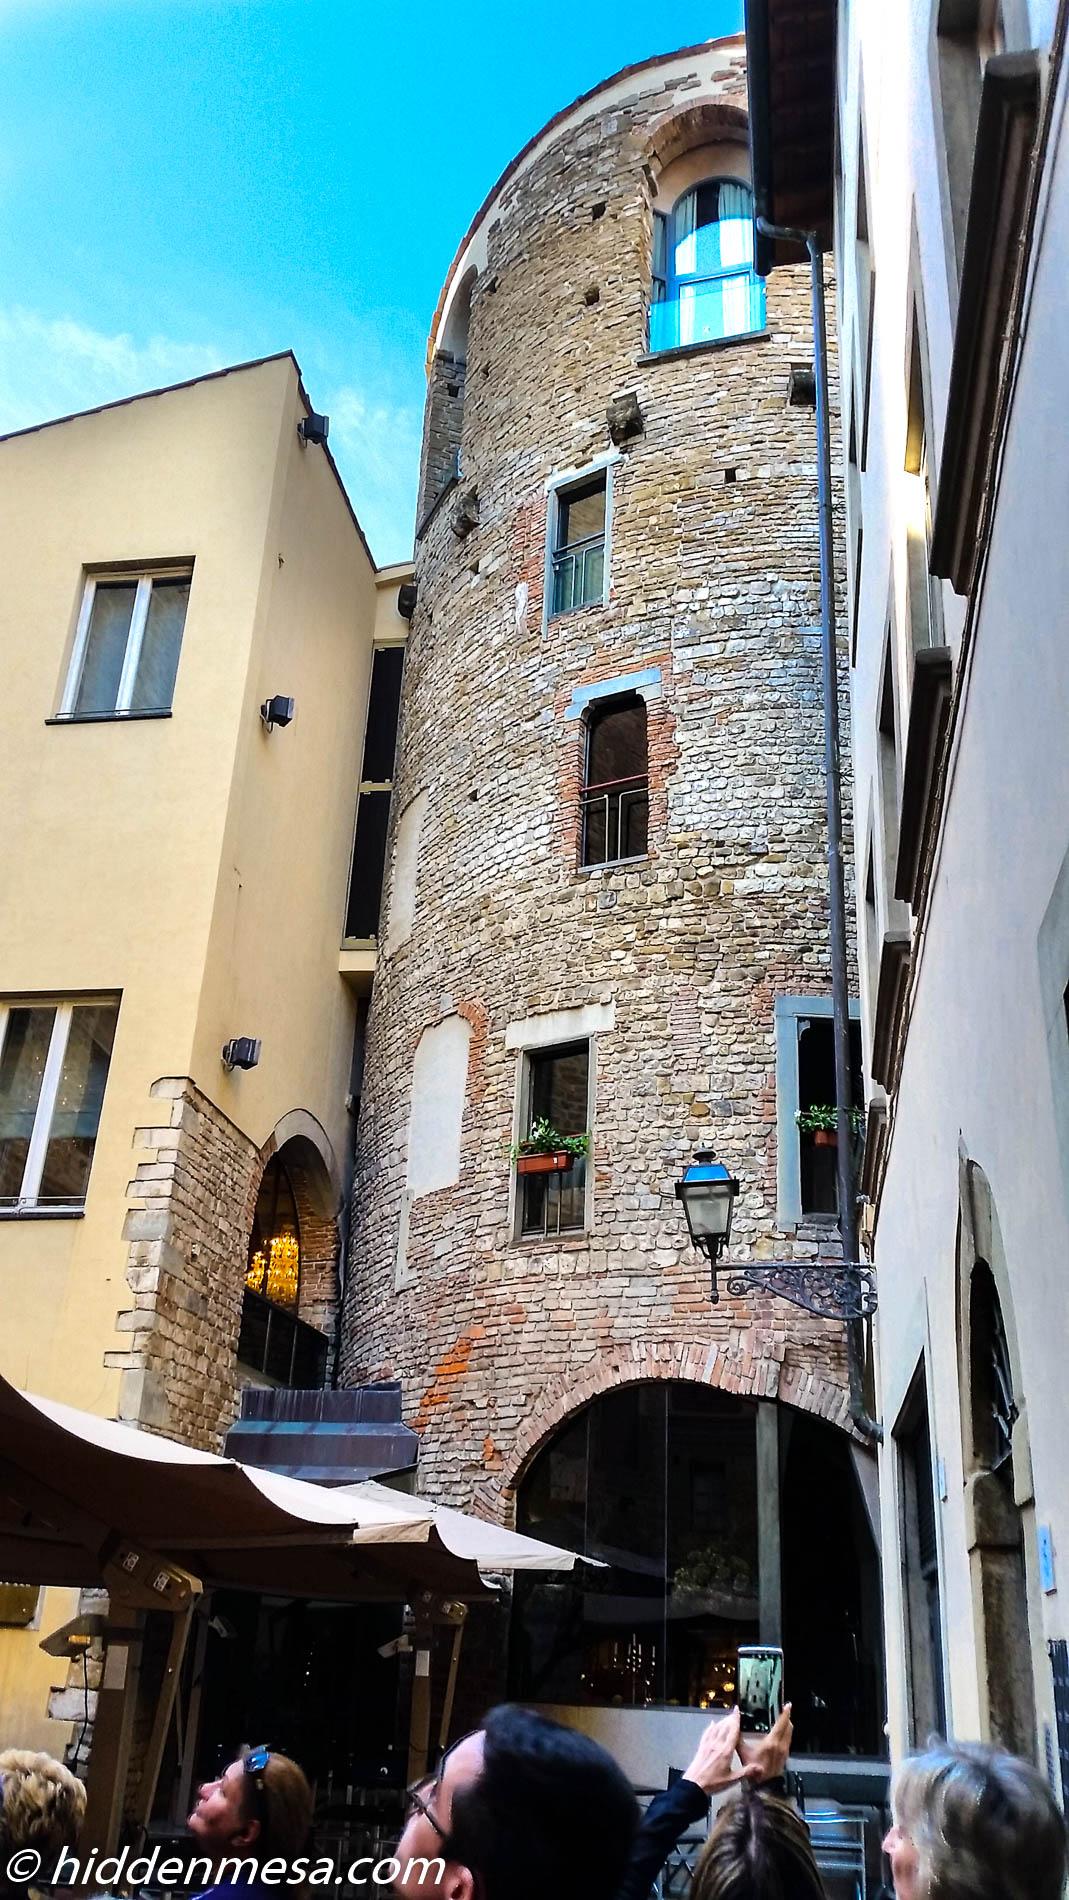 6th Century Building